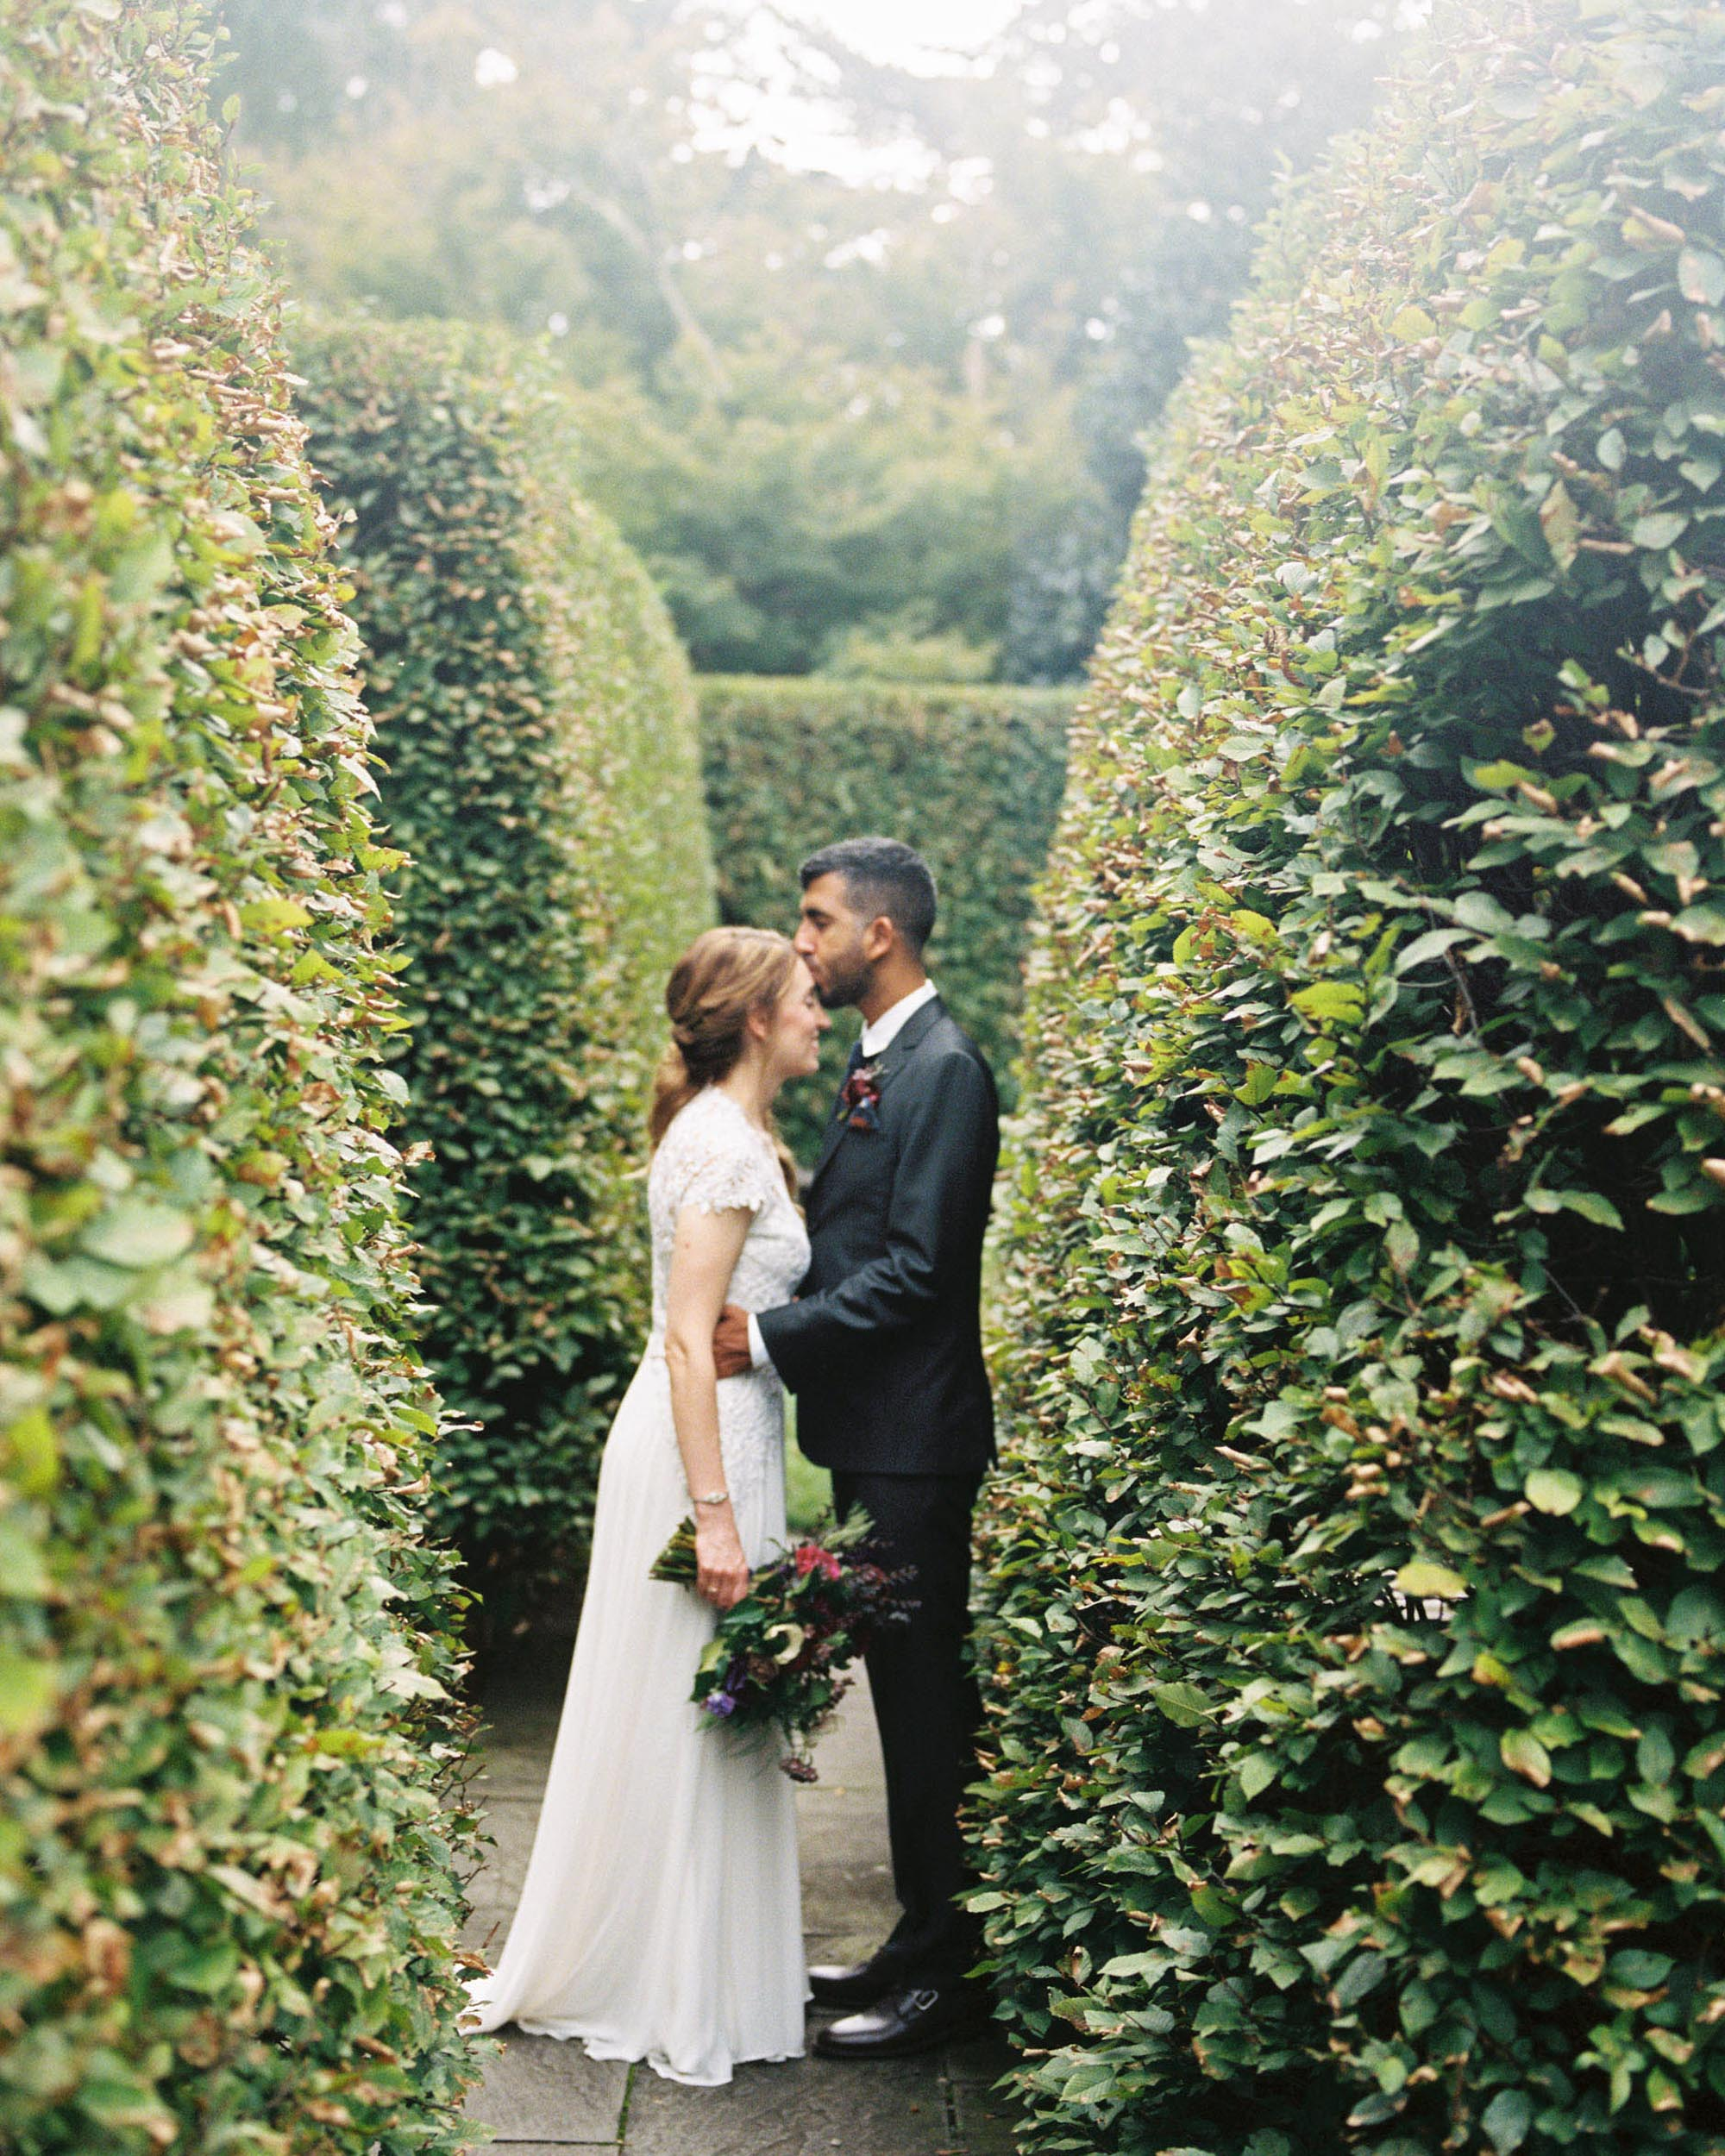 Wave Hill Wedding Photographer 0031 - Wave Hill